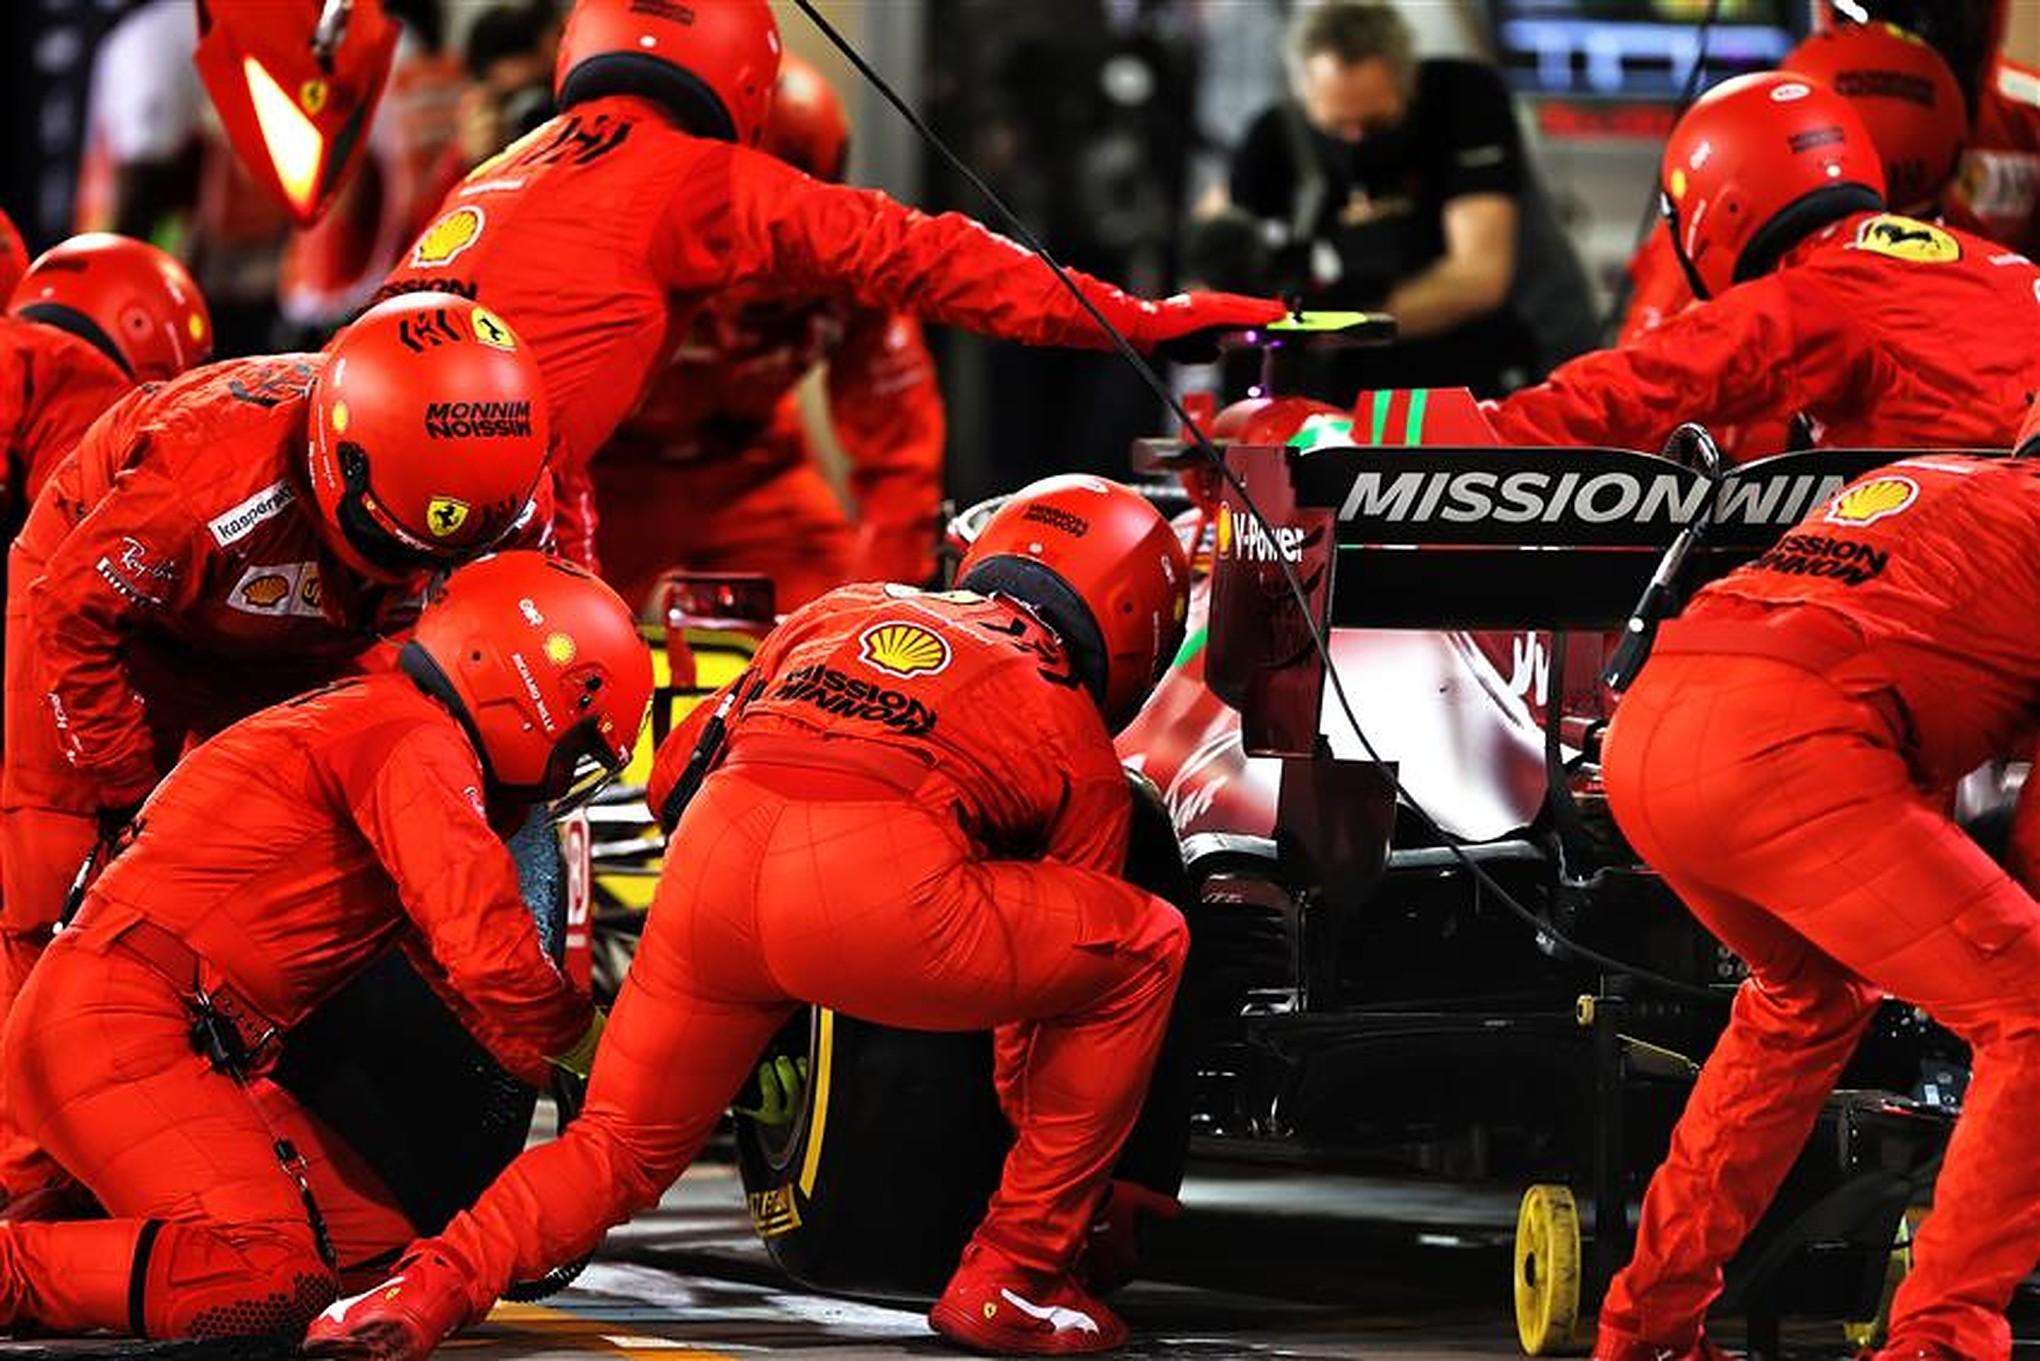 2021 Ferrari SF21 power unit and chassis development at Bahrain - Formula1news.co.uk